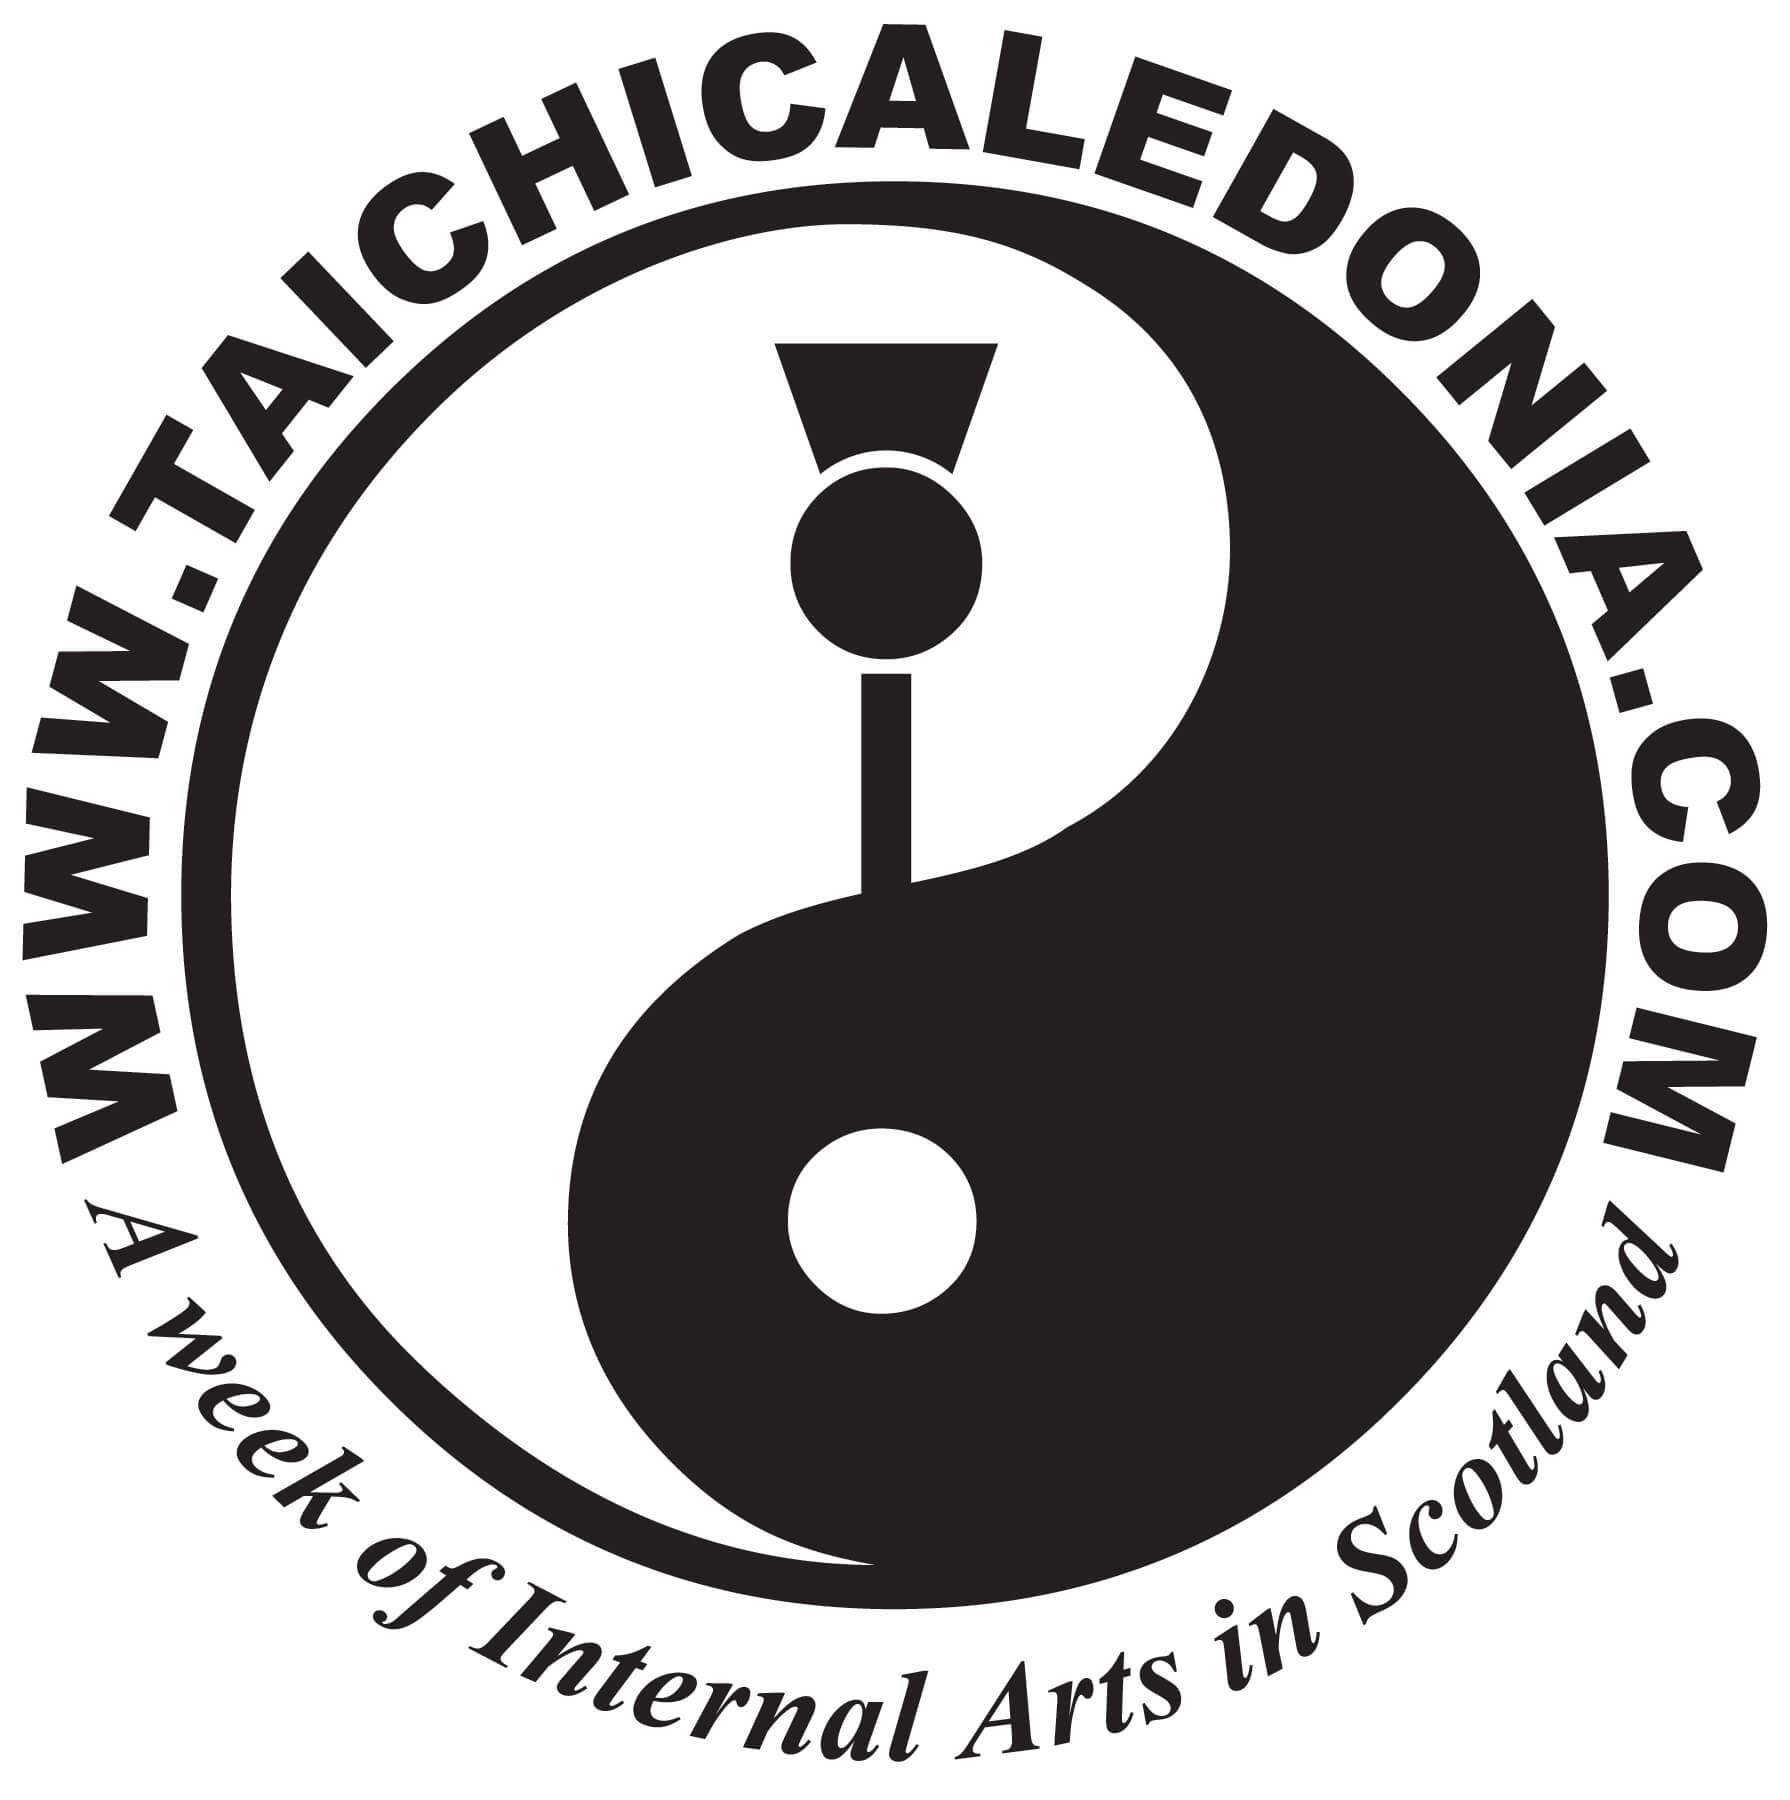 Logo of Tai Chi Caledonia Event